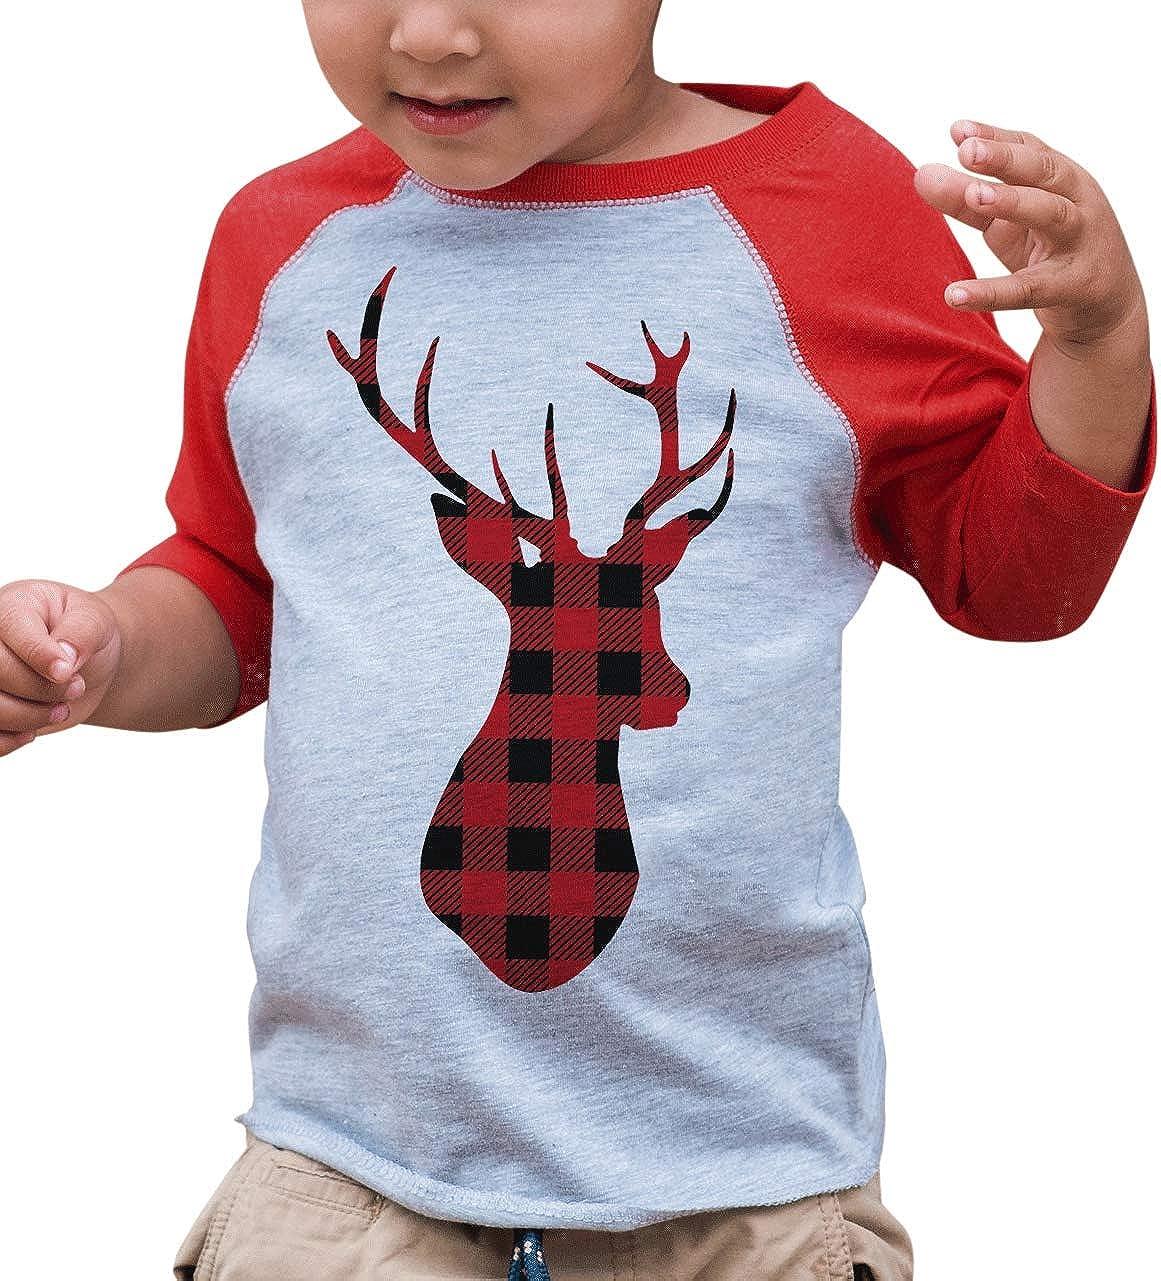 B01M24QTRV 7 ate 9 Apparel Kids Plaid Deer Christmas Raglan Shirt Red 71jMuP2RssL